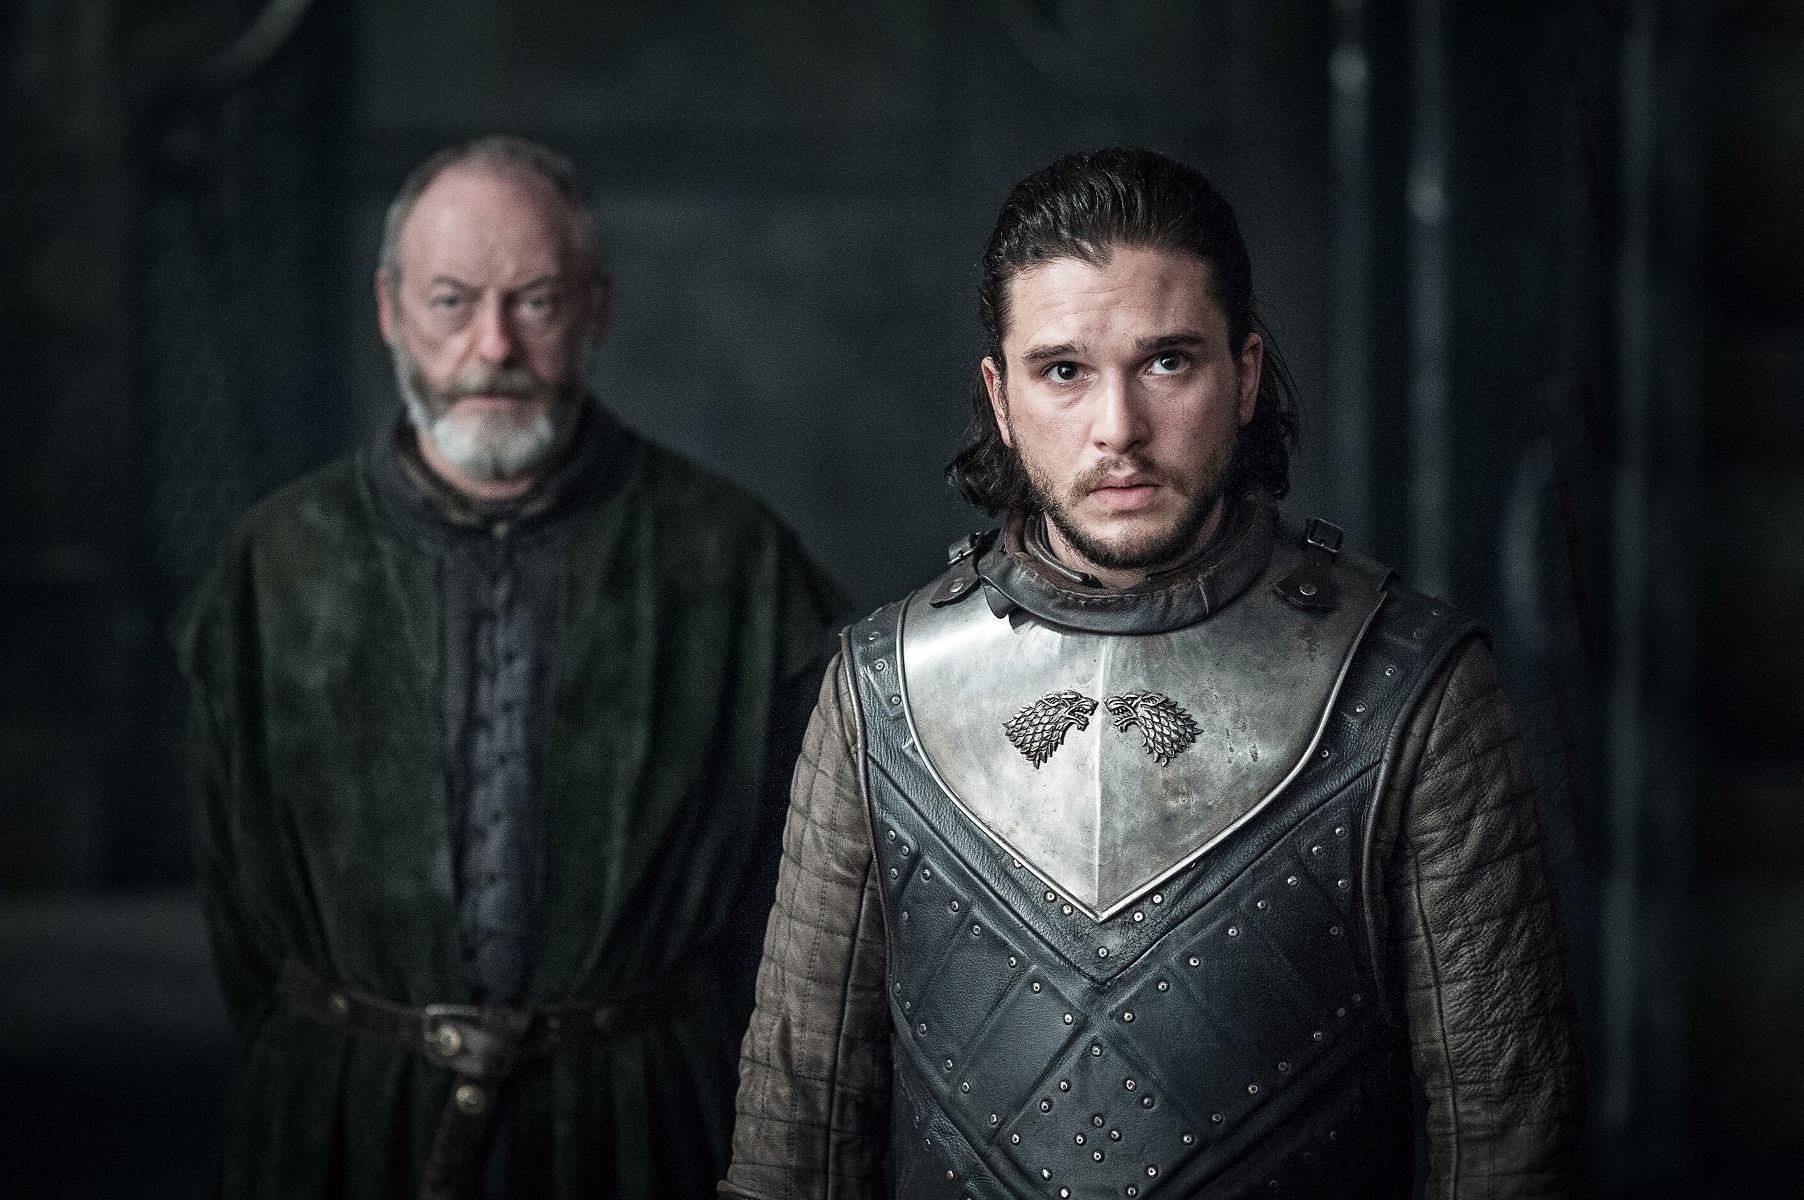 Kit Harington as Jon Snow and Liam Cunningham as Davos Seaworth. Photo: HBO